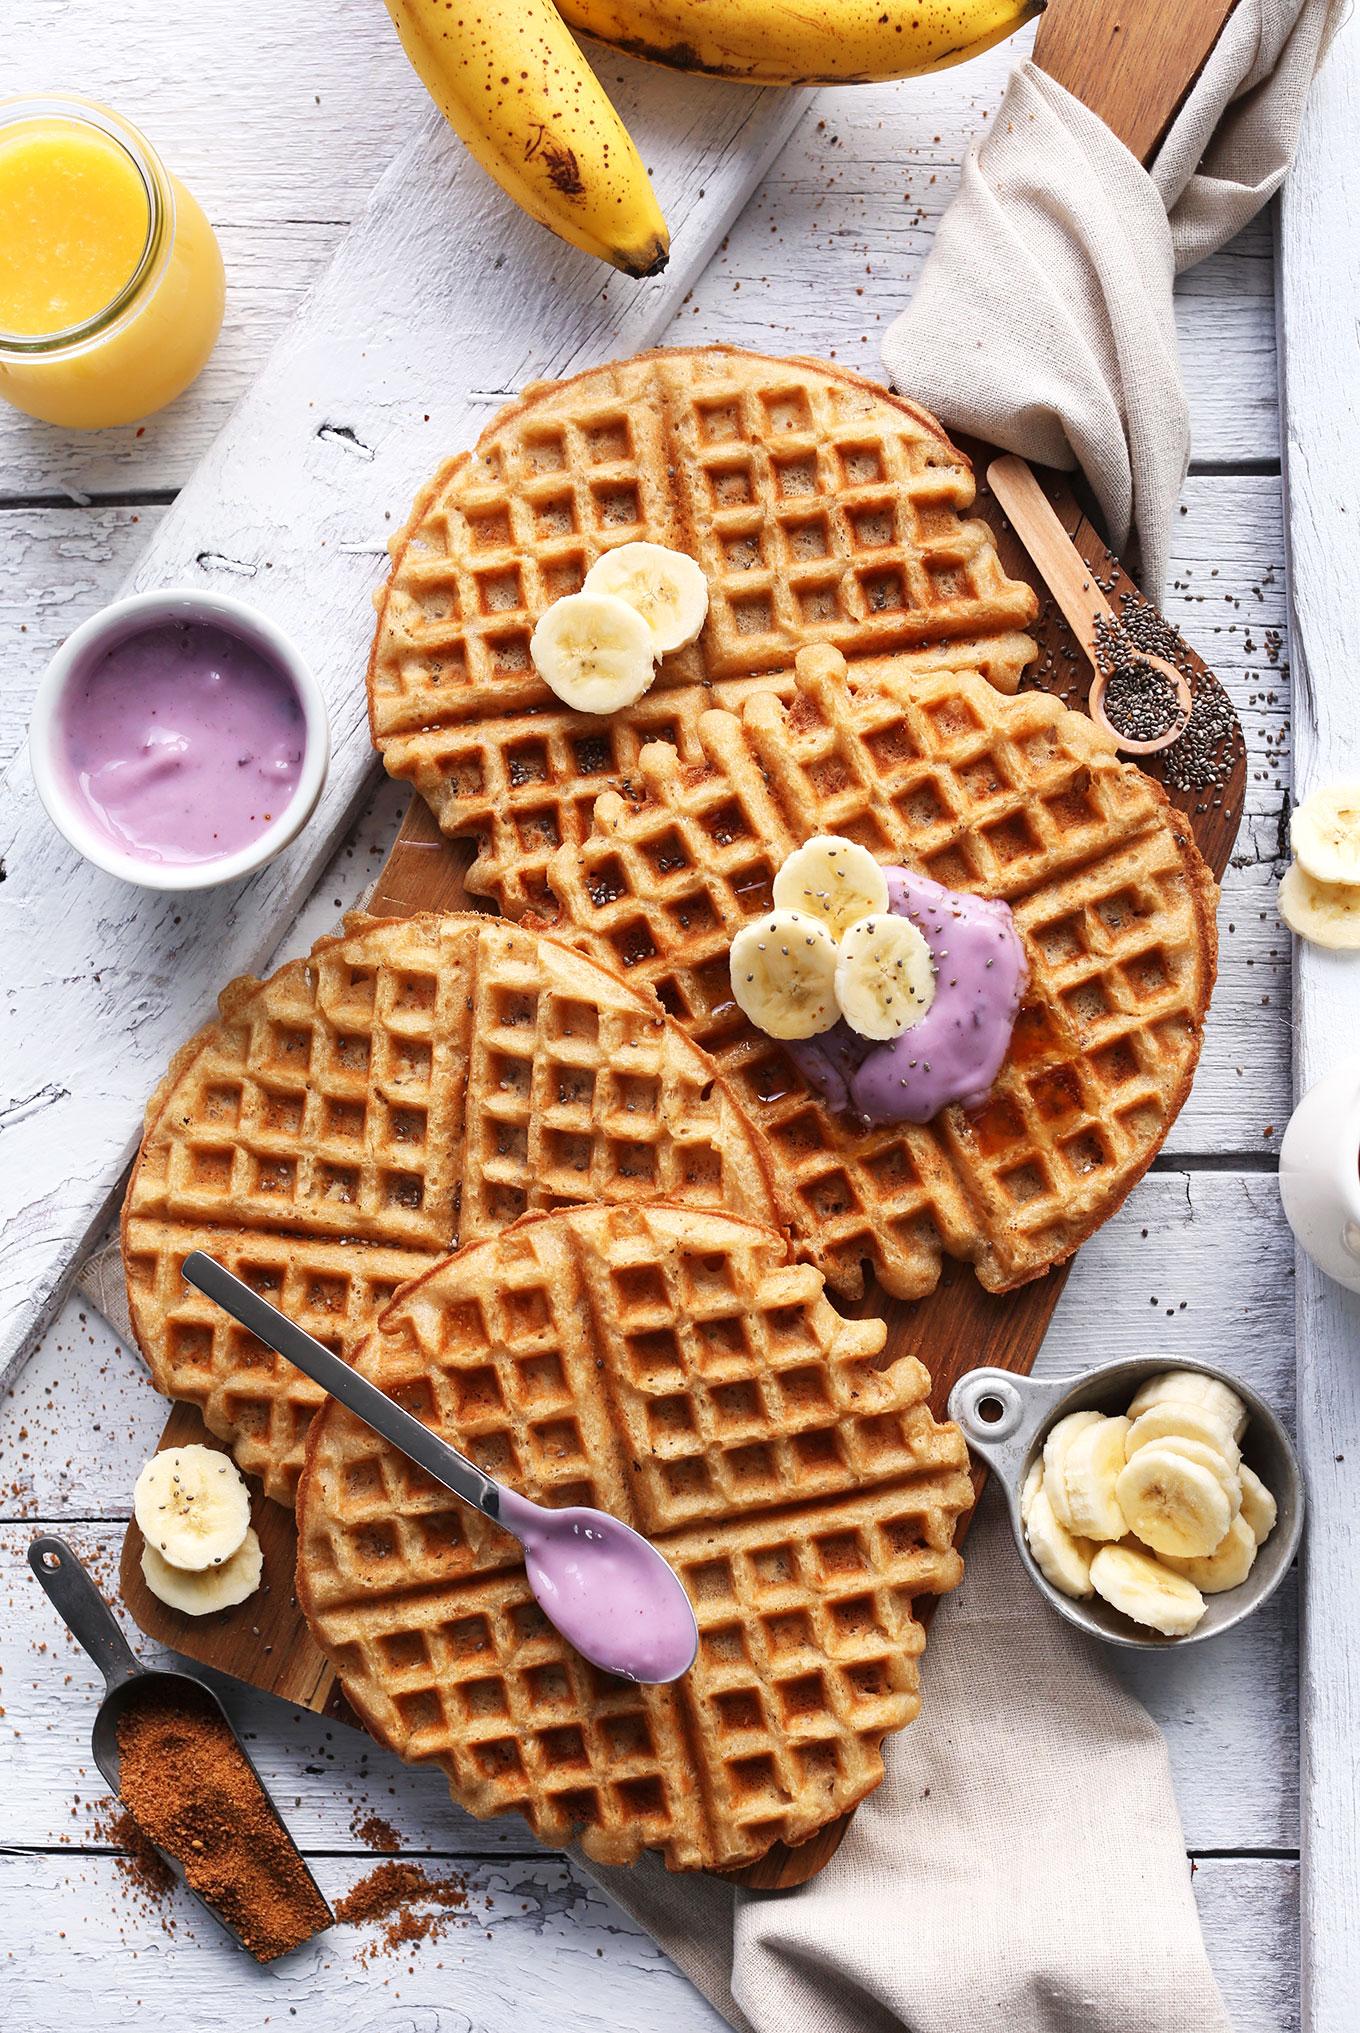 AMAZING-Vegan-GF-Yogurt-Waffles-Crisp-on-the-outside-tender-on-the-inside-and-so-delicious-vegan-glutenfree